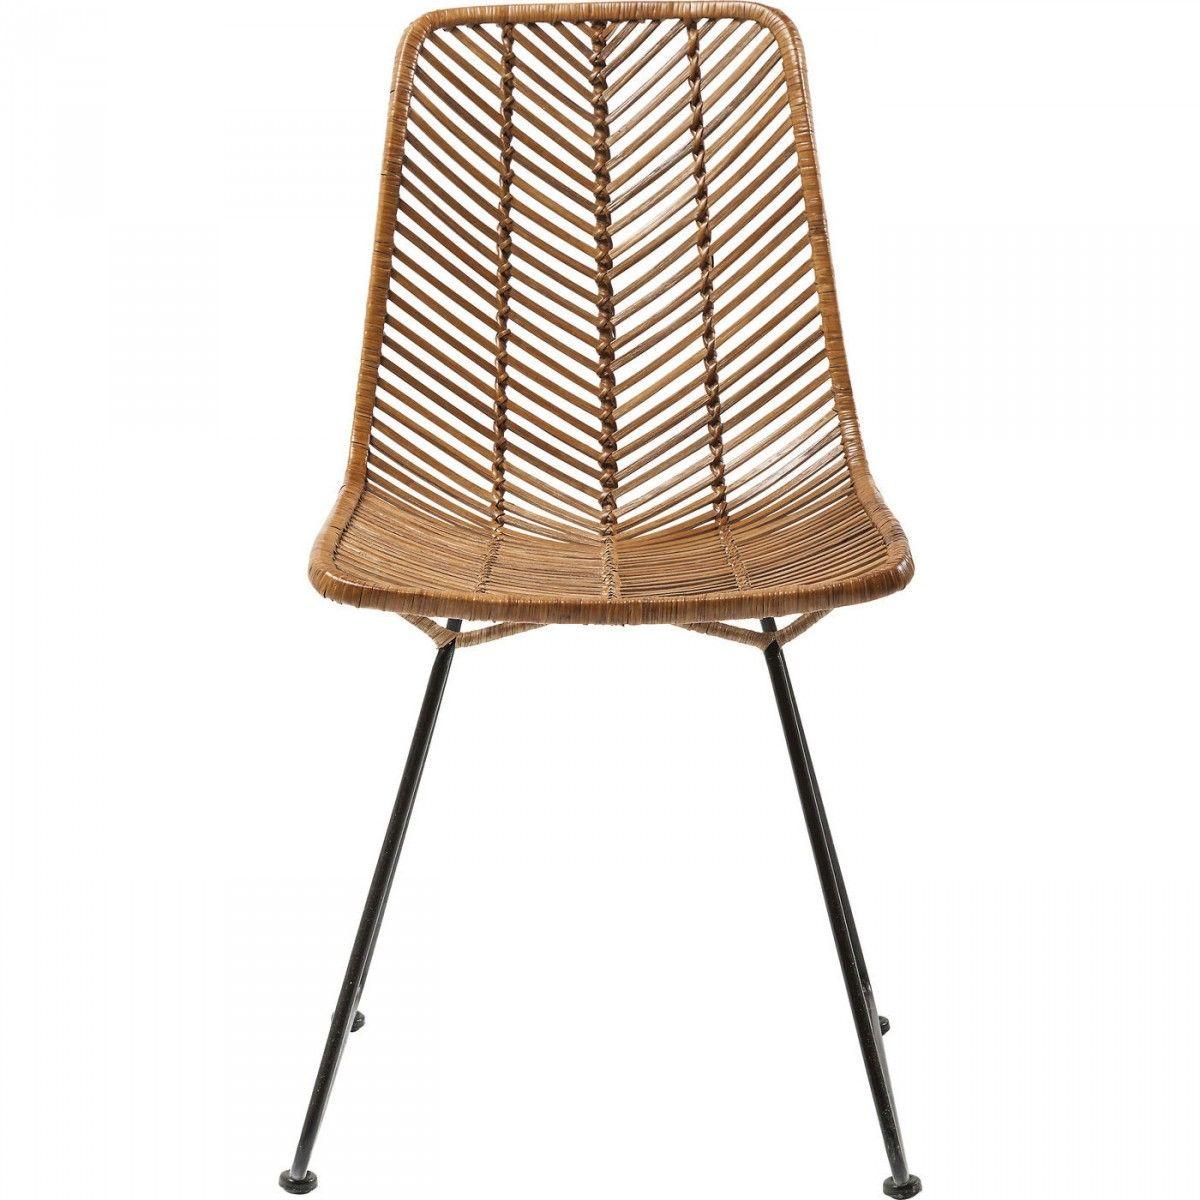 Rattan und metall esszimmer st hle m belideen for Design stuhl geflecht